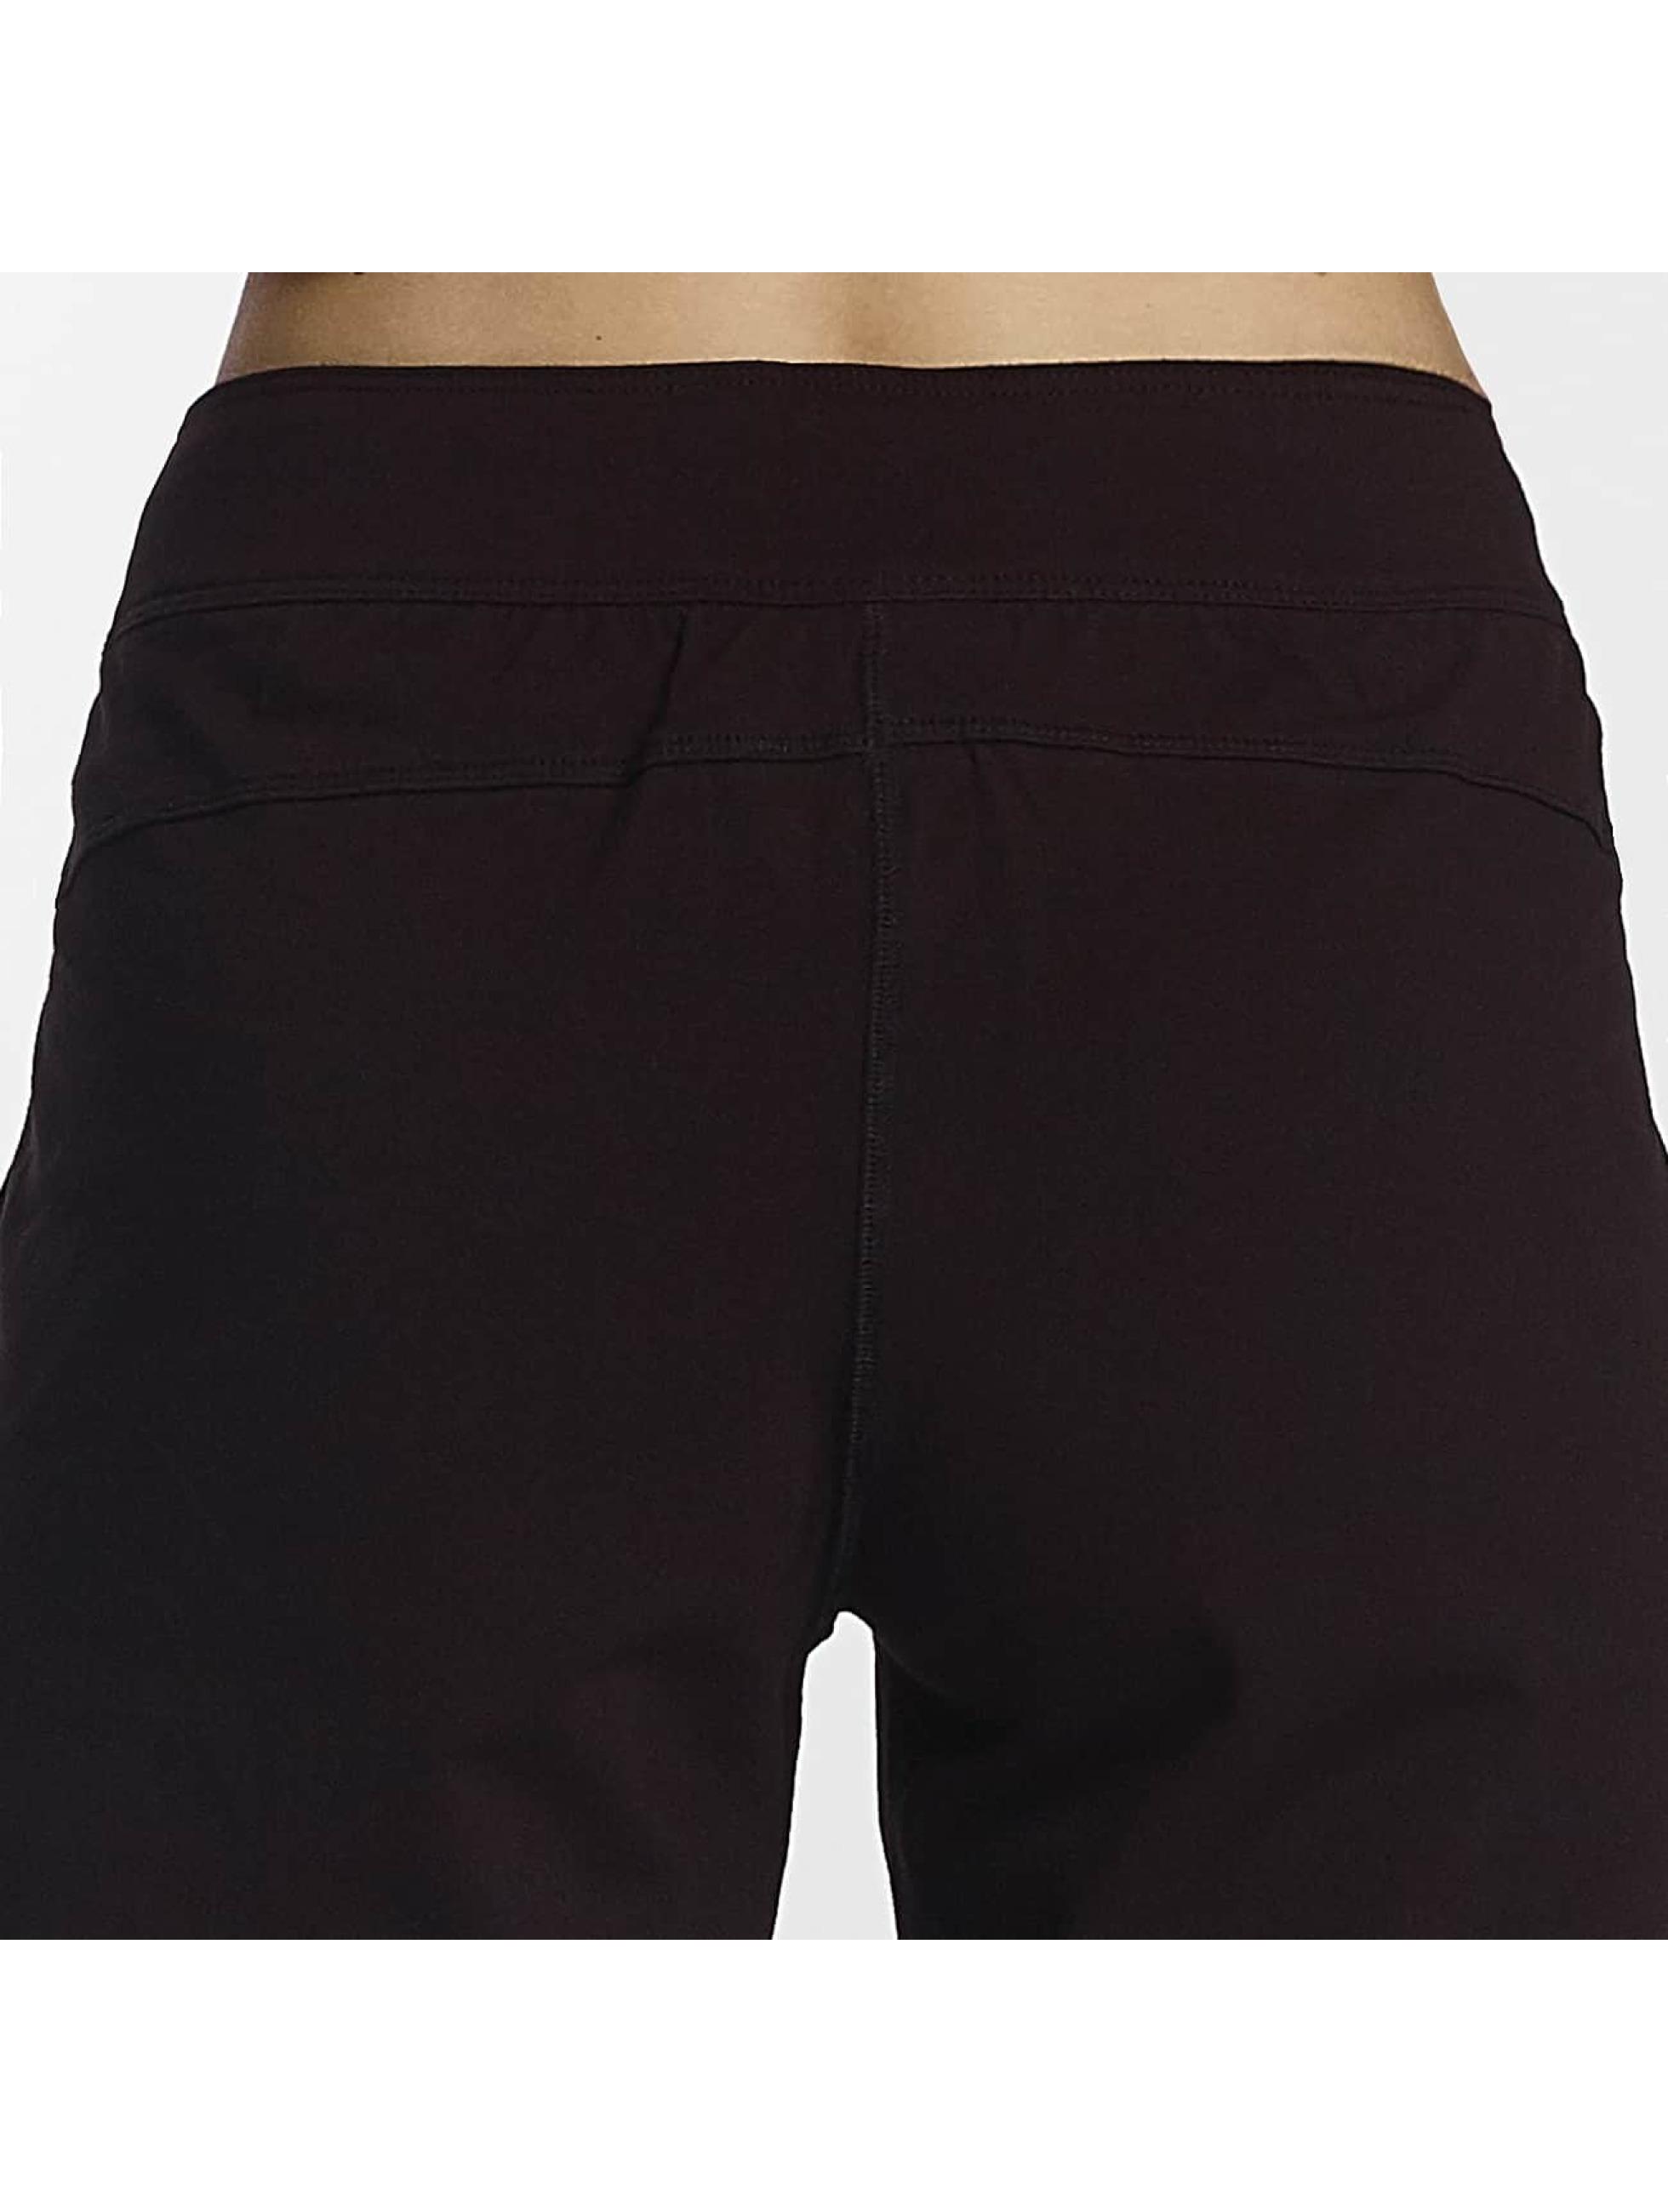 Champion Athletics Sweat Pant Authentic Athletic Apparel Cuffed black